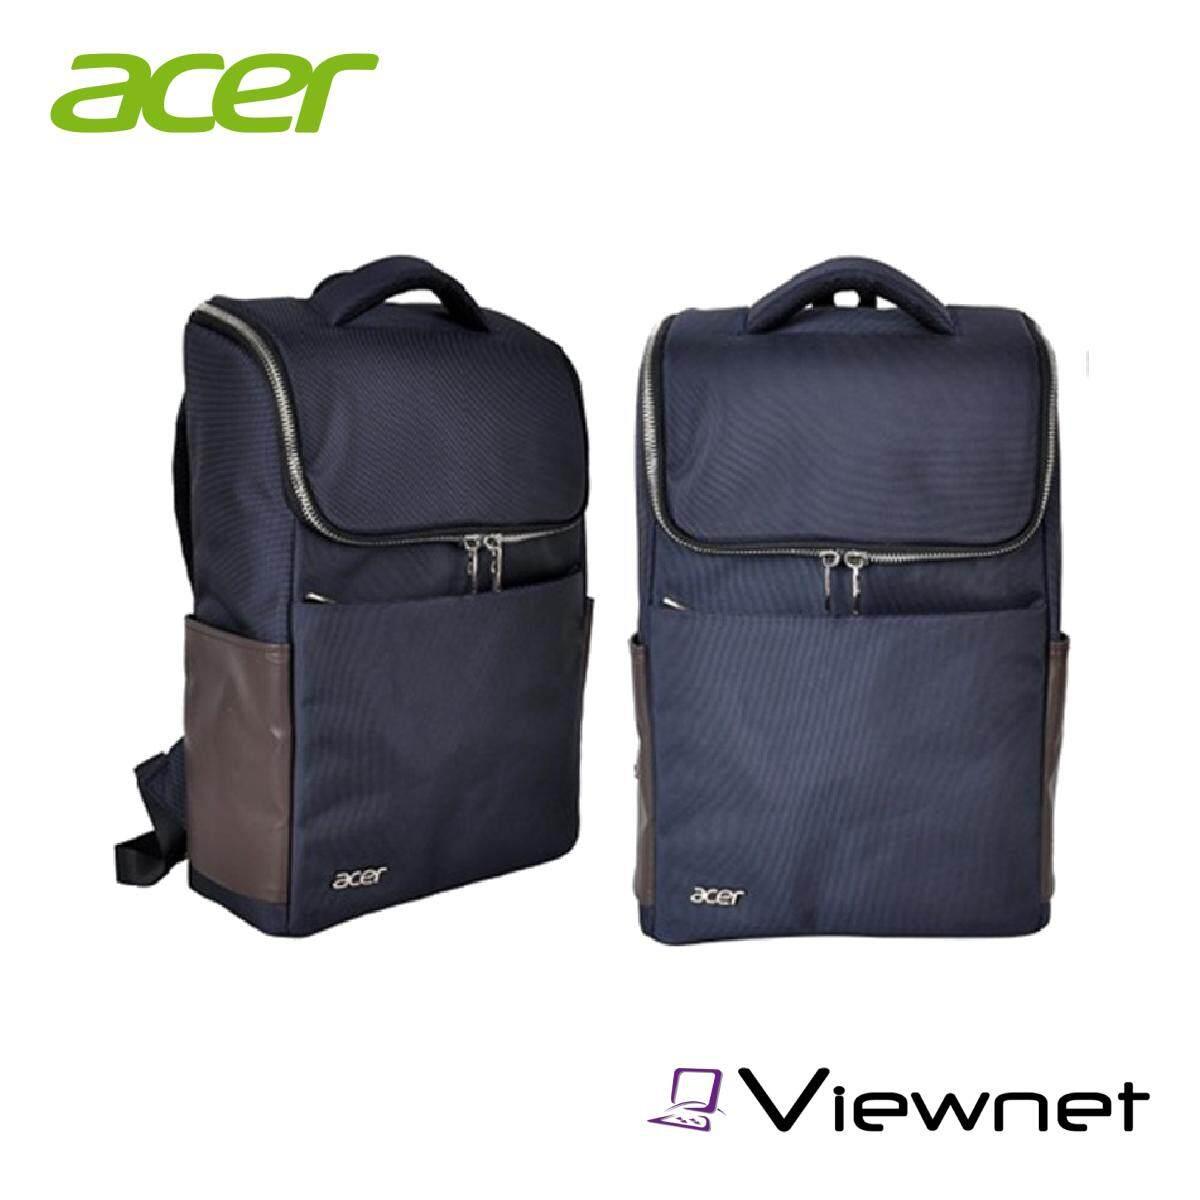 Acer Premium Backpack 15.6